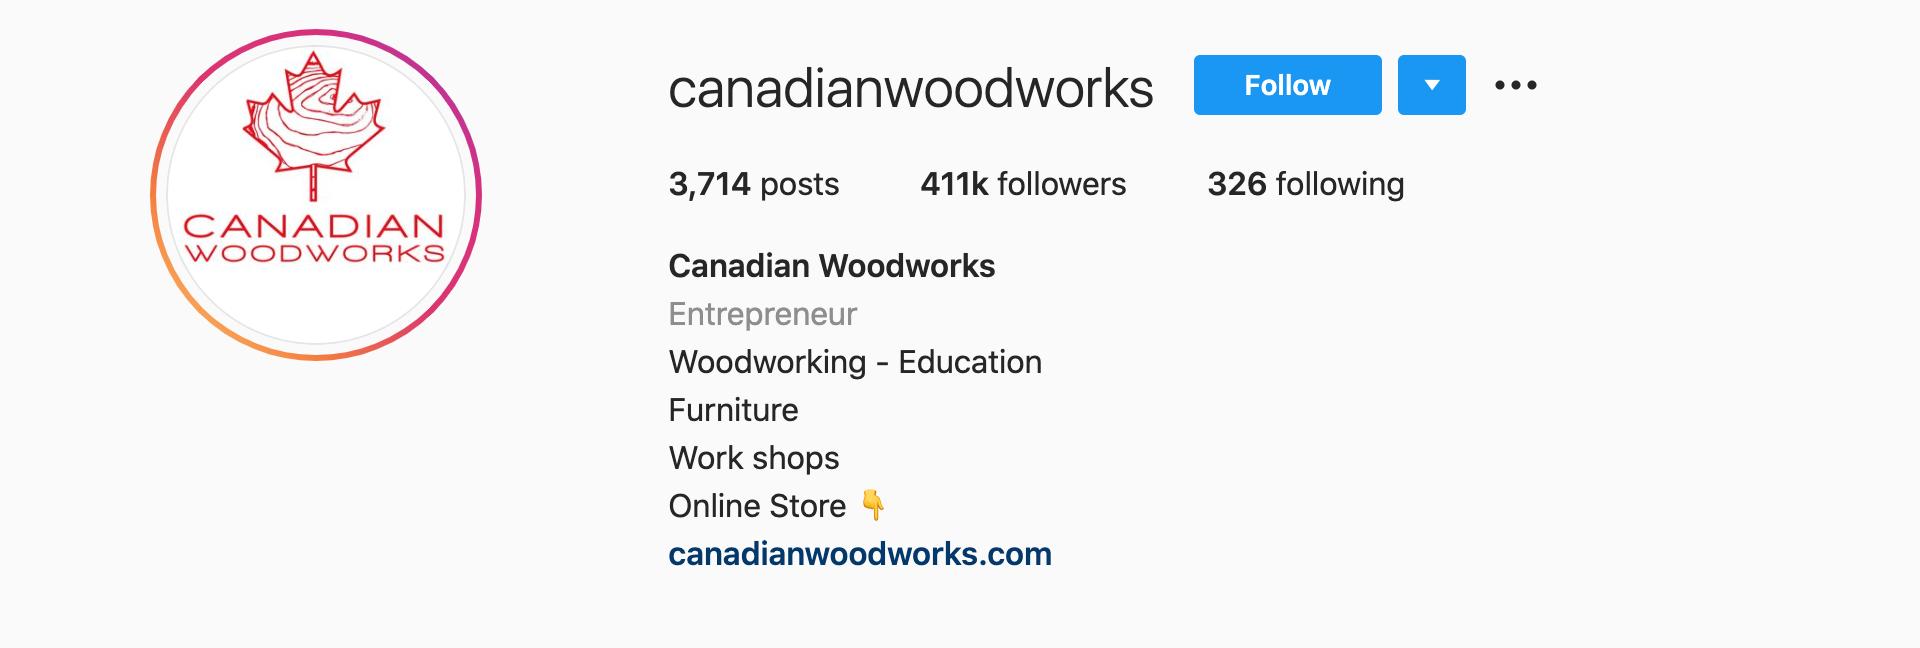 canadian-woodworks-instagram-profile